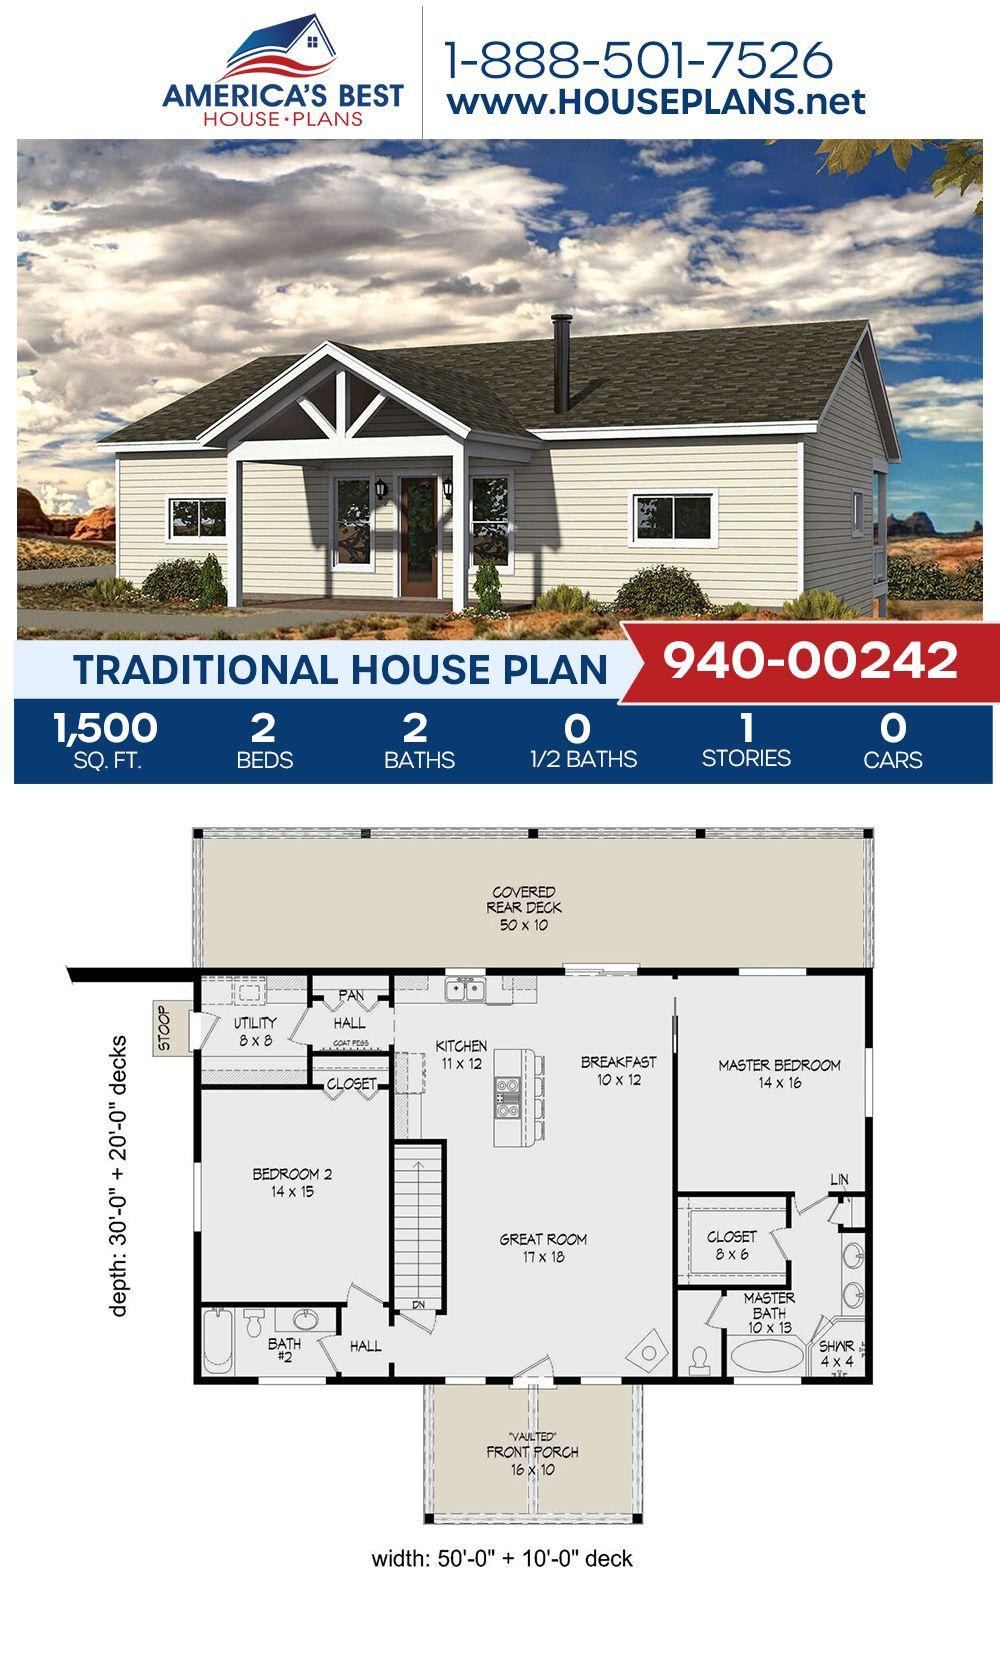 House Plan 94000242 Traditional Plan 1,500 Square Feet